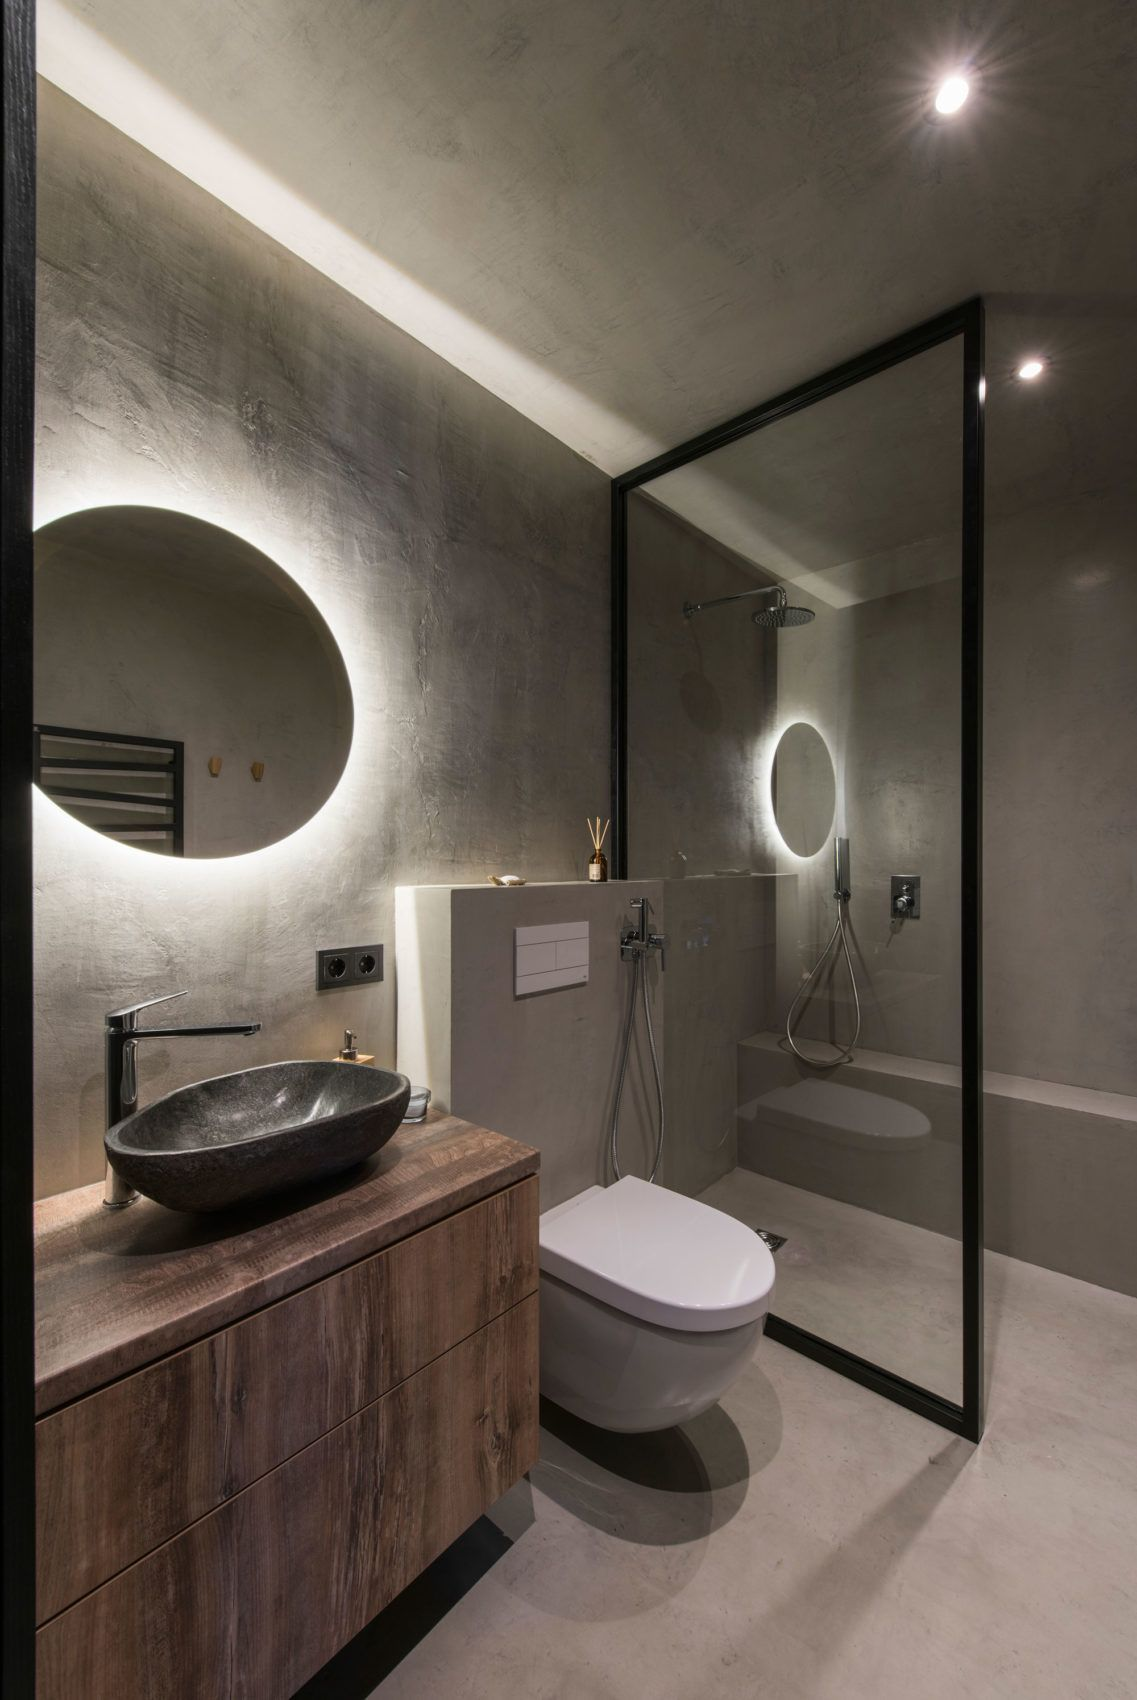 Modern Bathroom Bathroom Lighting Industrial Bathroom Decor Industrial Style Bathroom Industrial Bathroom Design